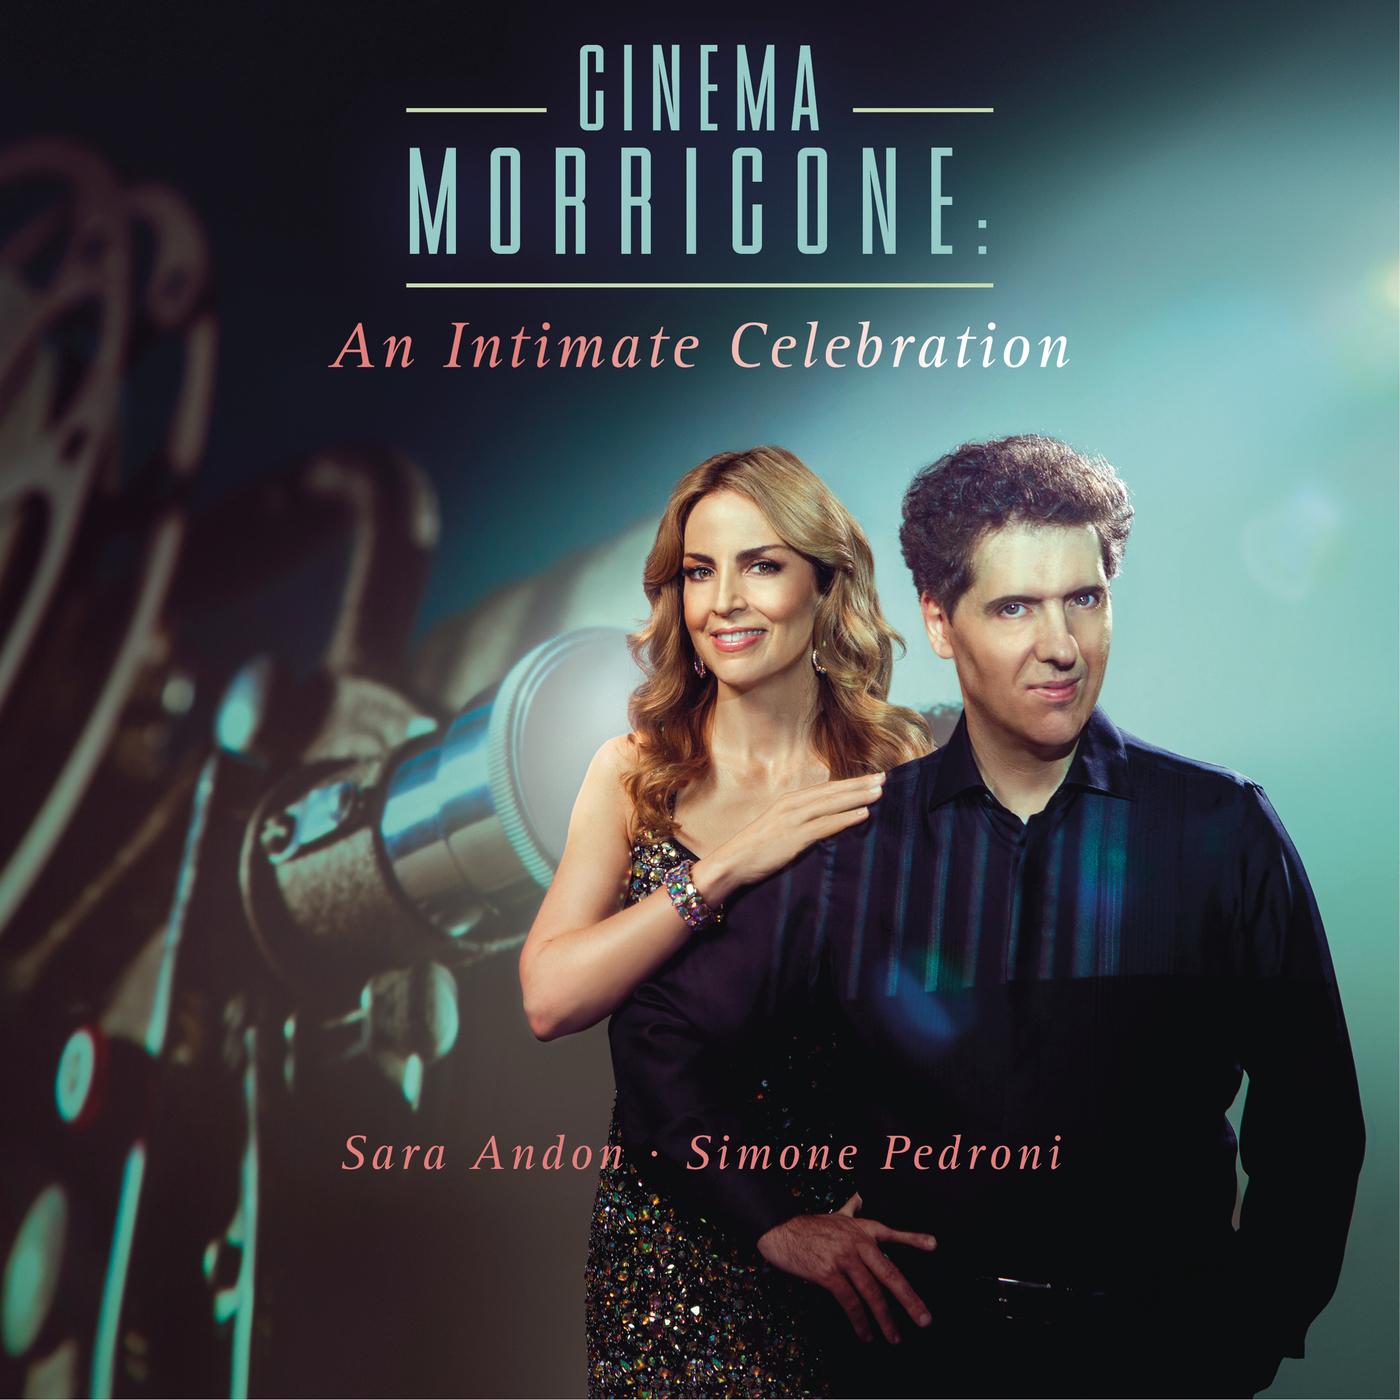 Cinema Morricone - An Intimate Celebration - Simone Pedroni